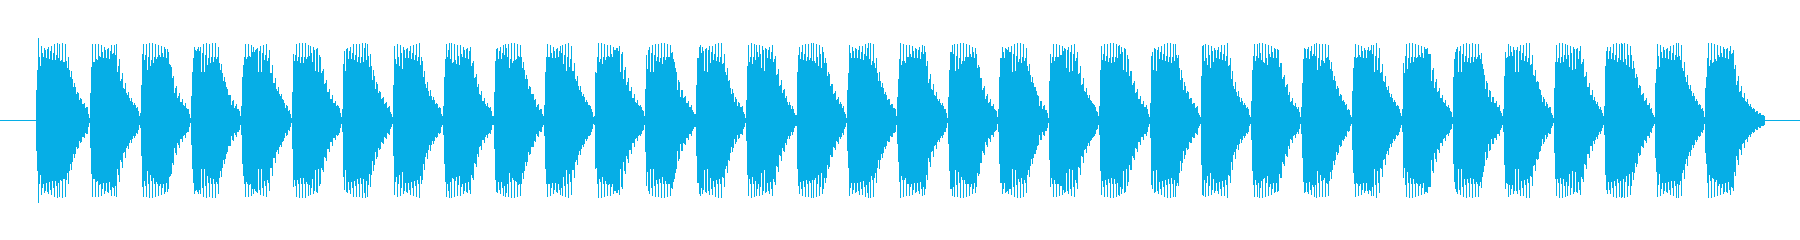 HPゲージの効果音の再生済みの波形